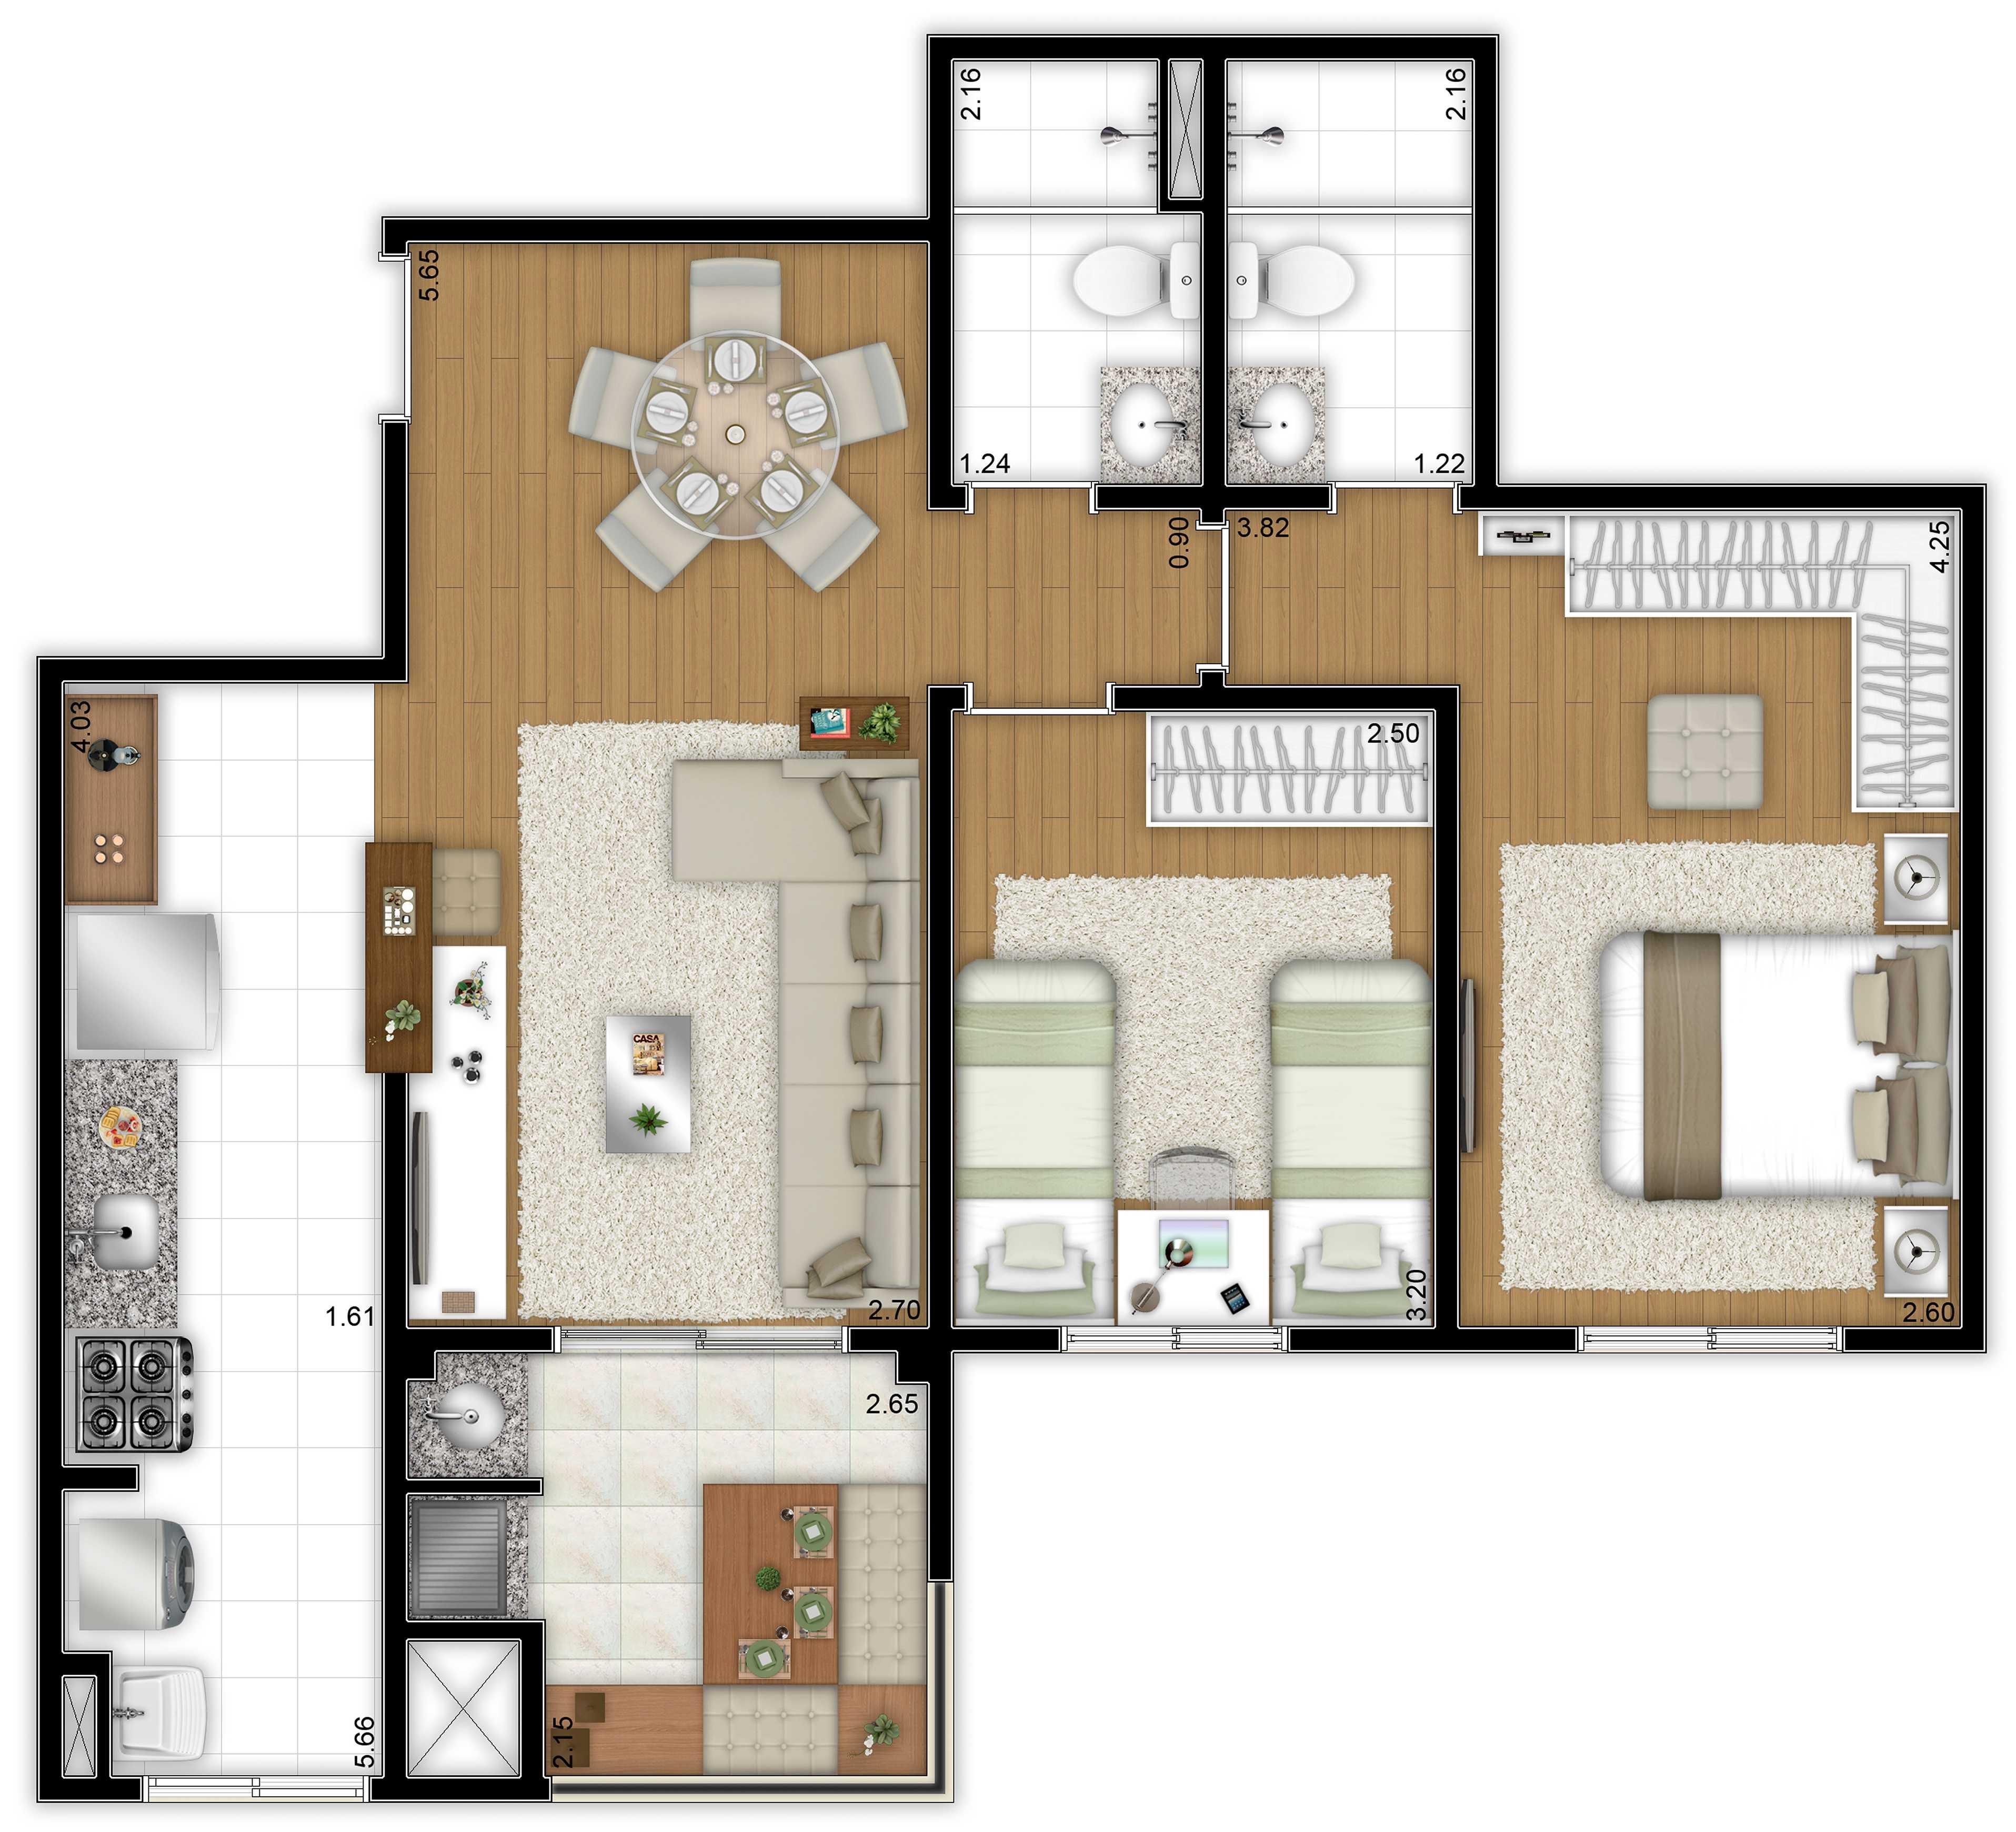 65,86m² - 2 dorms